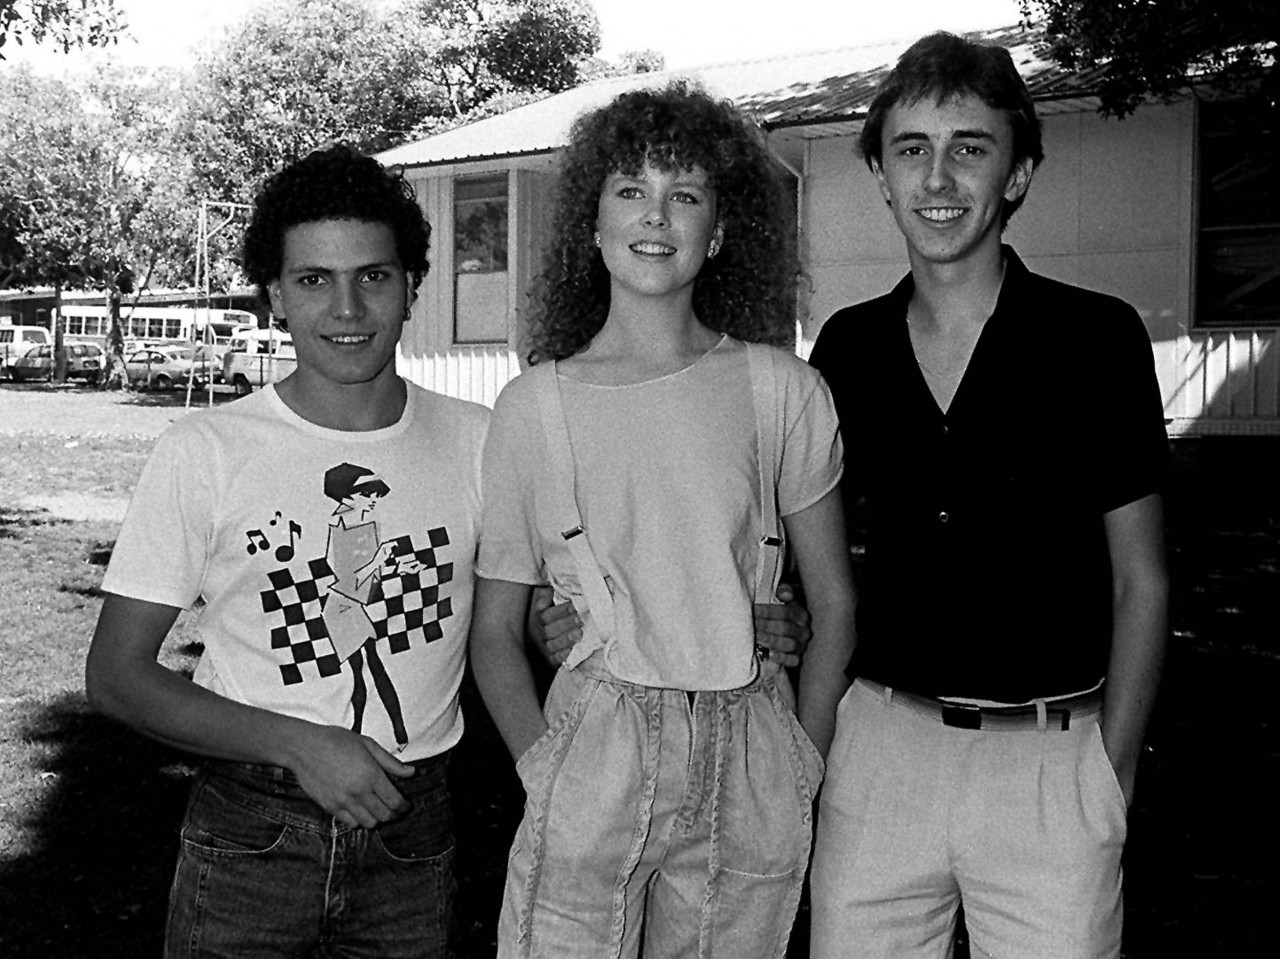 Николь Кидман образца начала 80-х